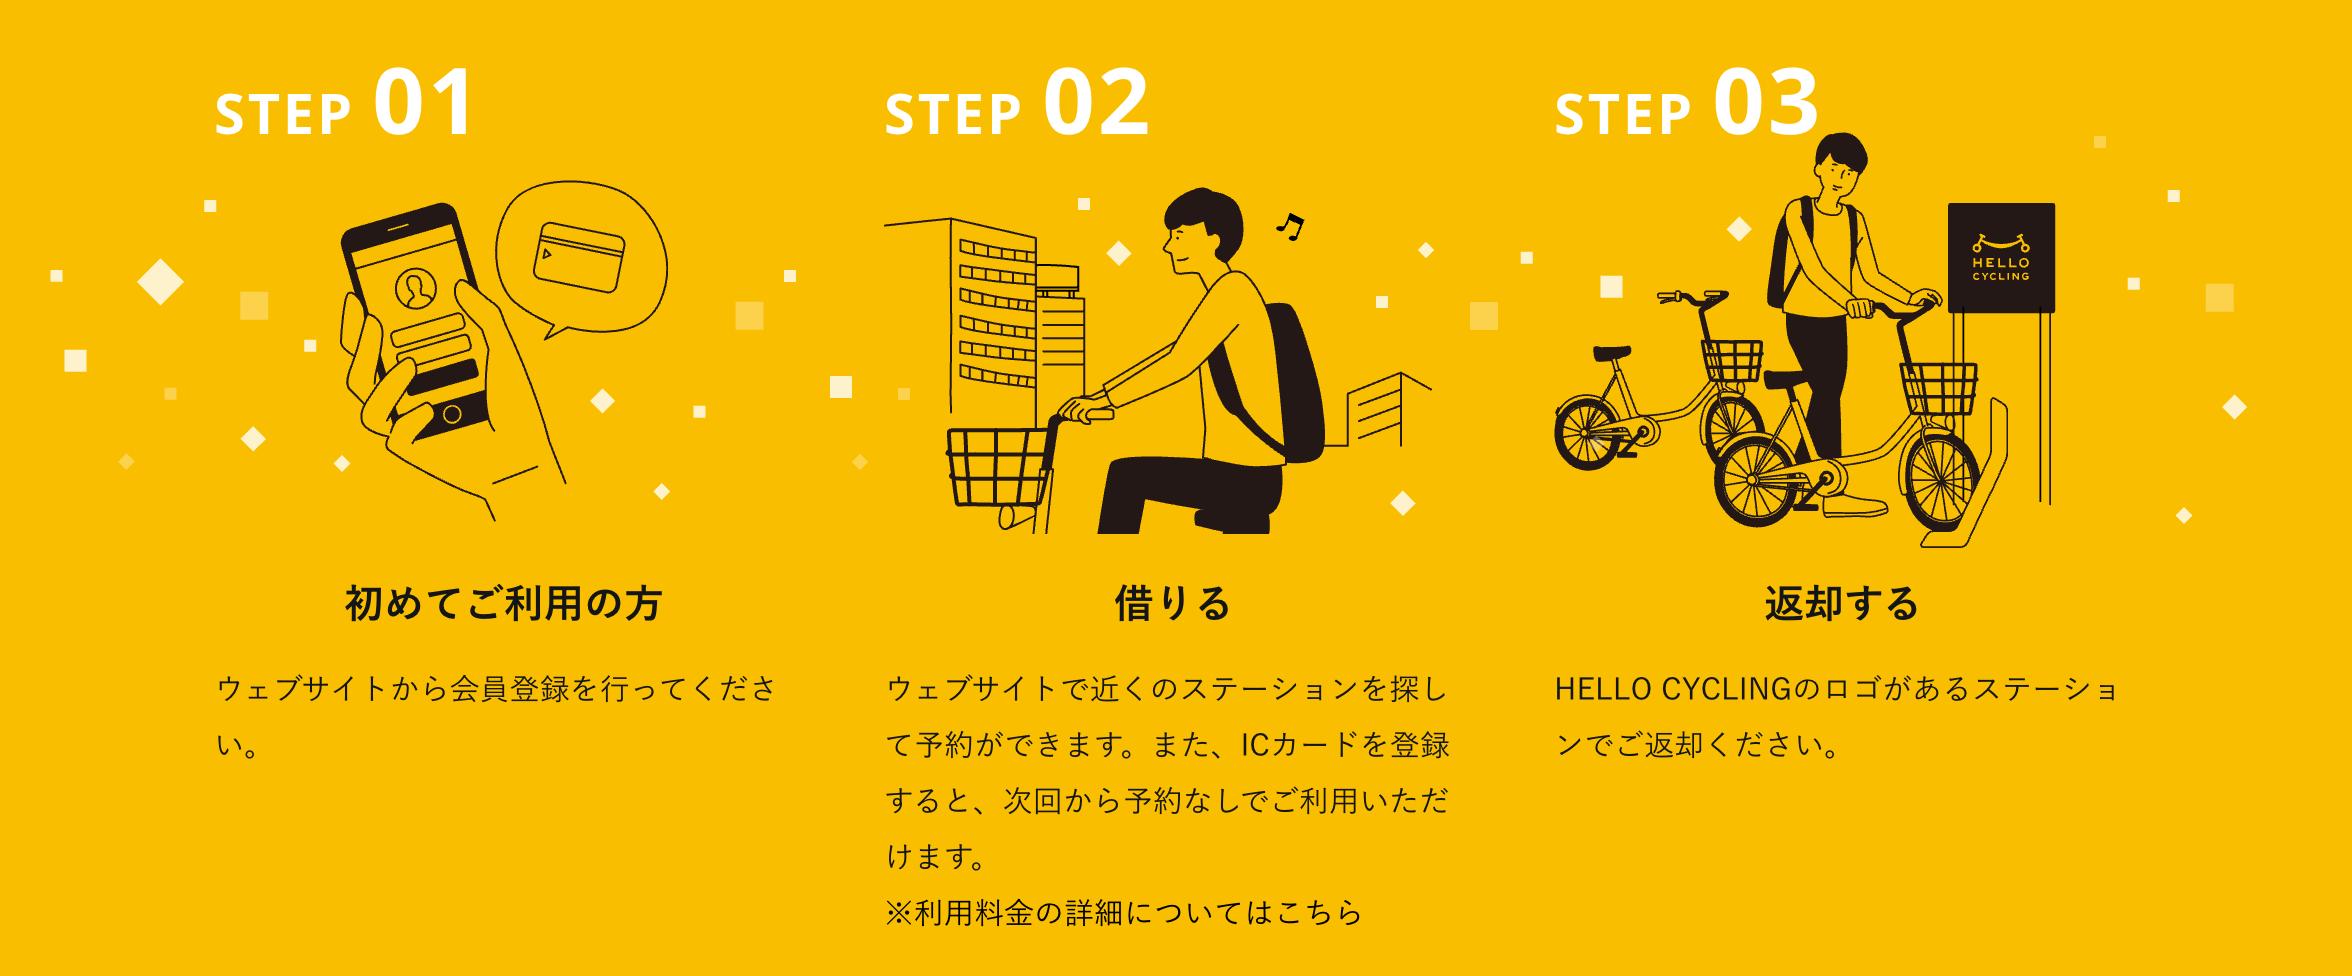 Gyazo - HELLO CYCLING(ハローサイクリング)シェアサイクリングサービスです